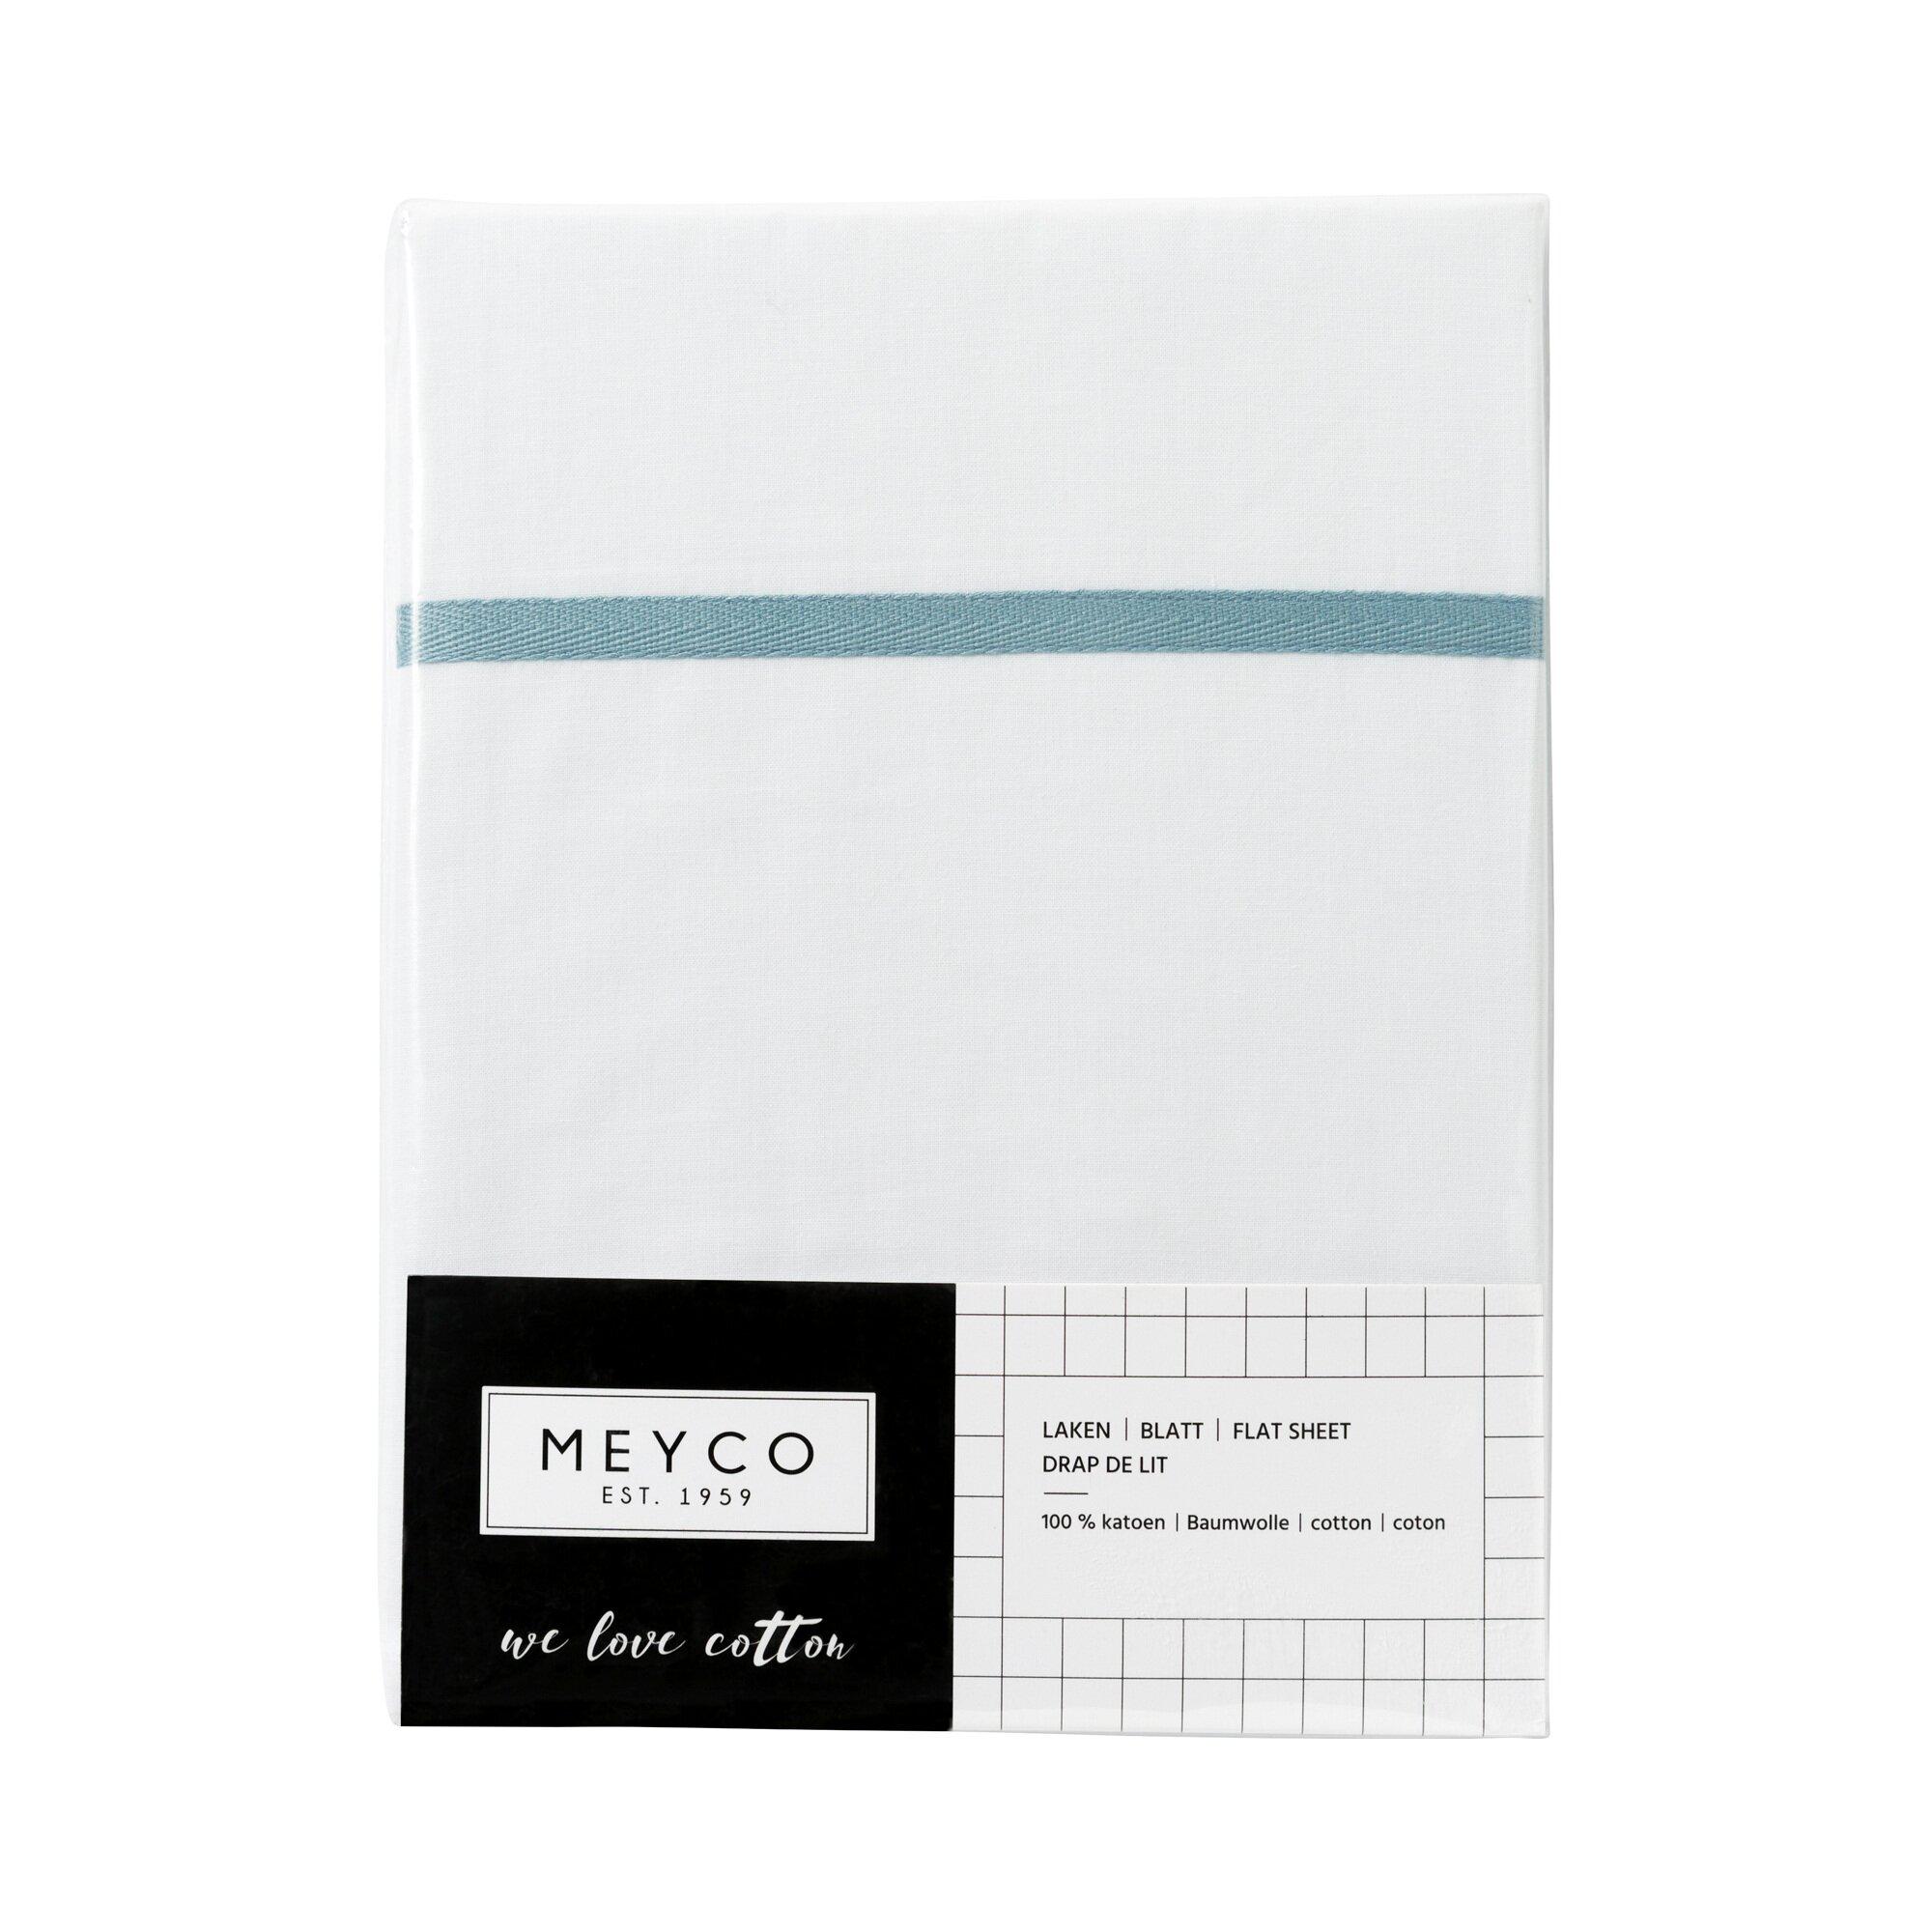 Meyco Bettlaken Biesen 75x100 cm